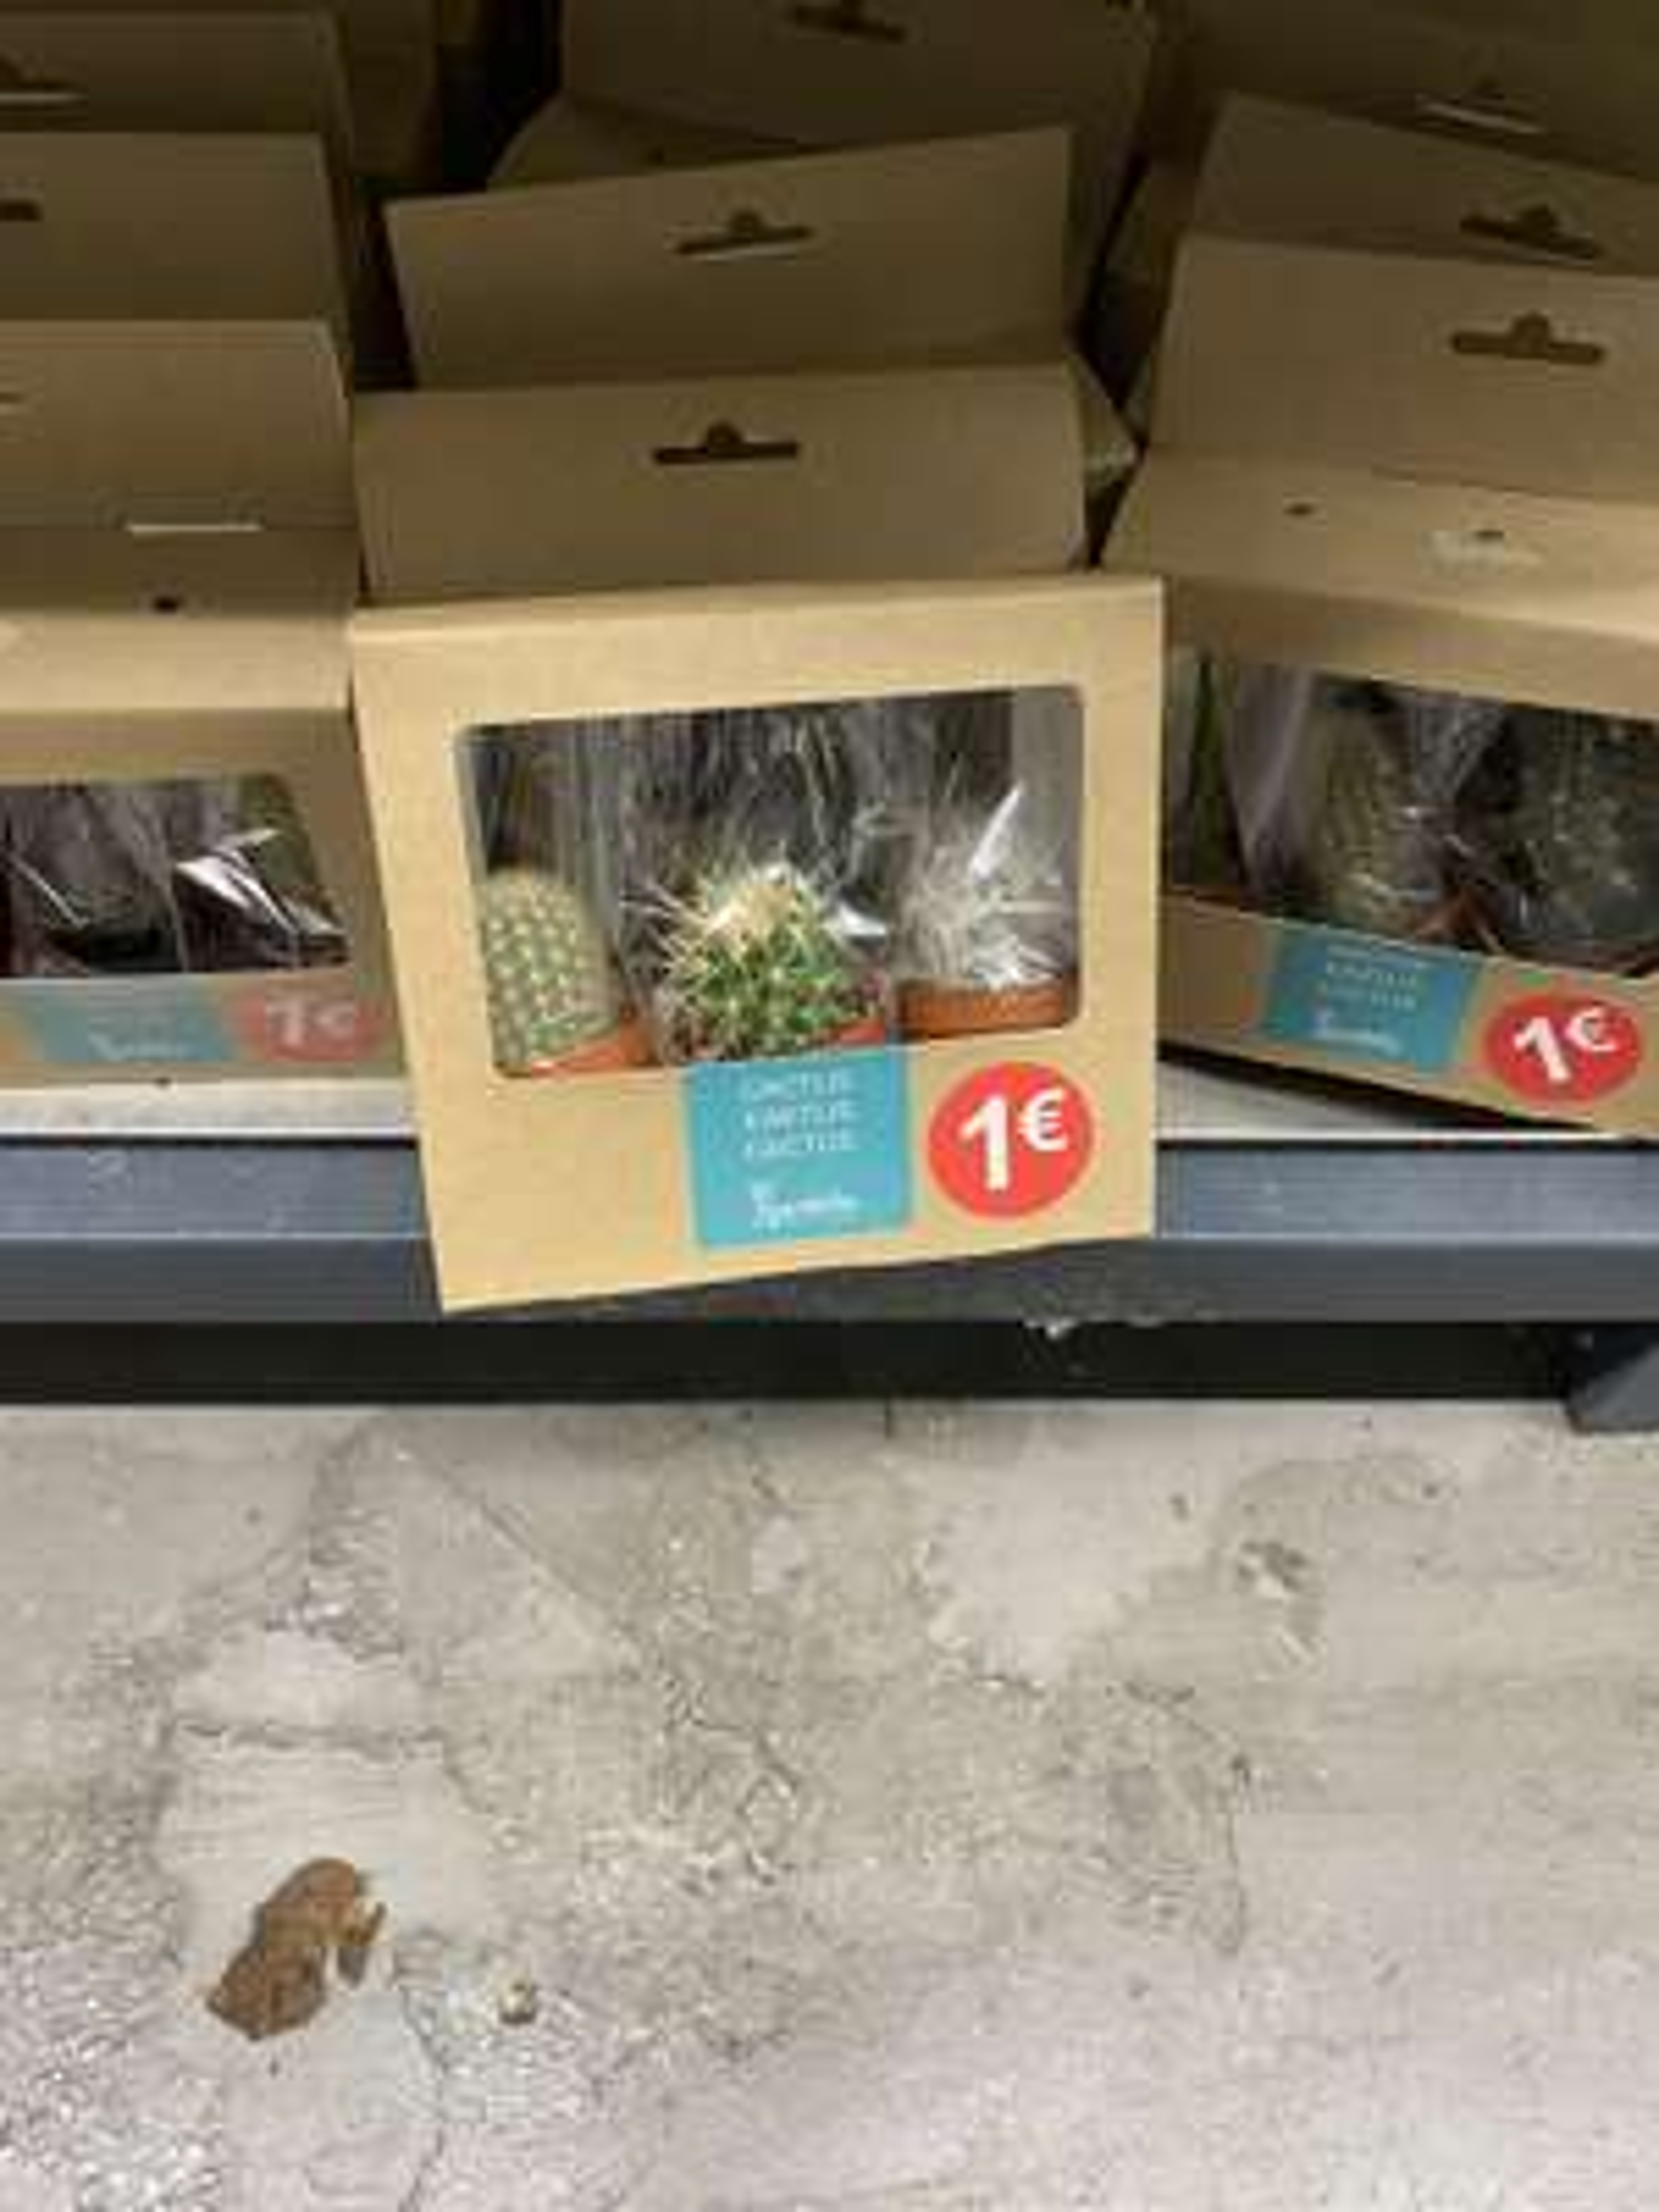 Lot de 3 Mini Cactus en pot Gardelly Holland - Olivet (45)